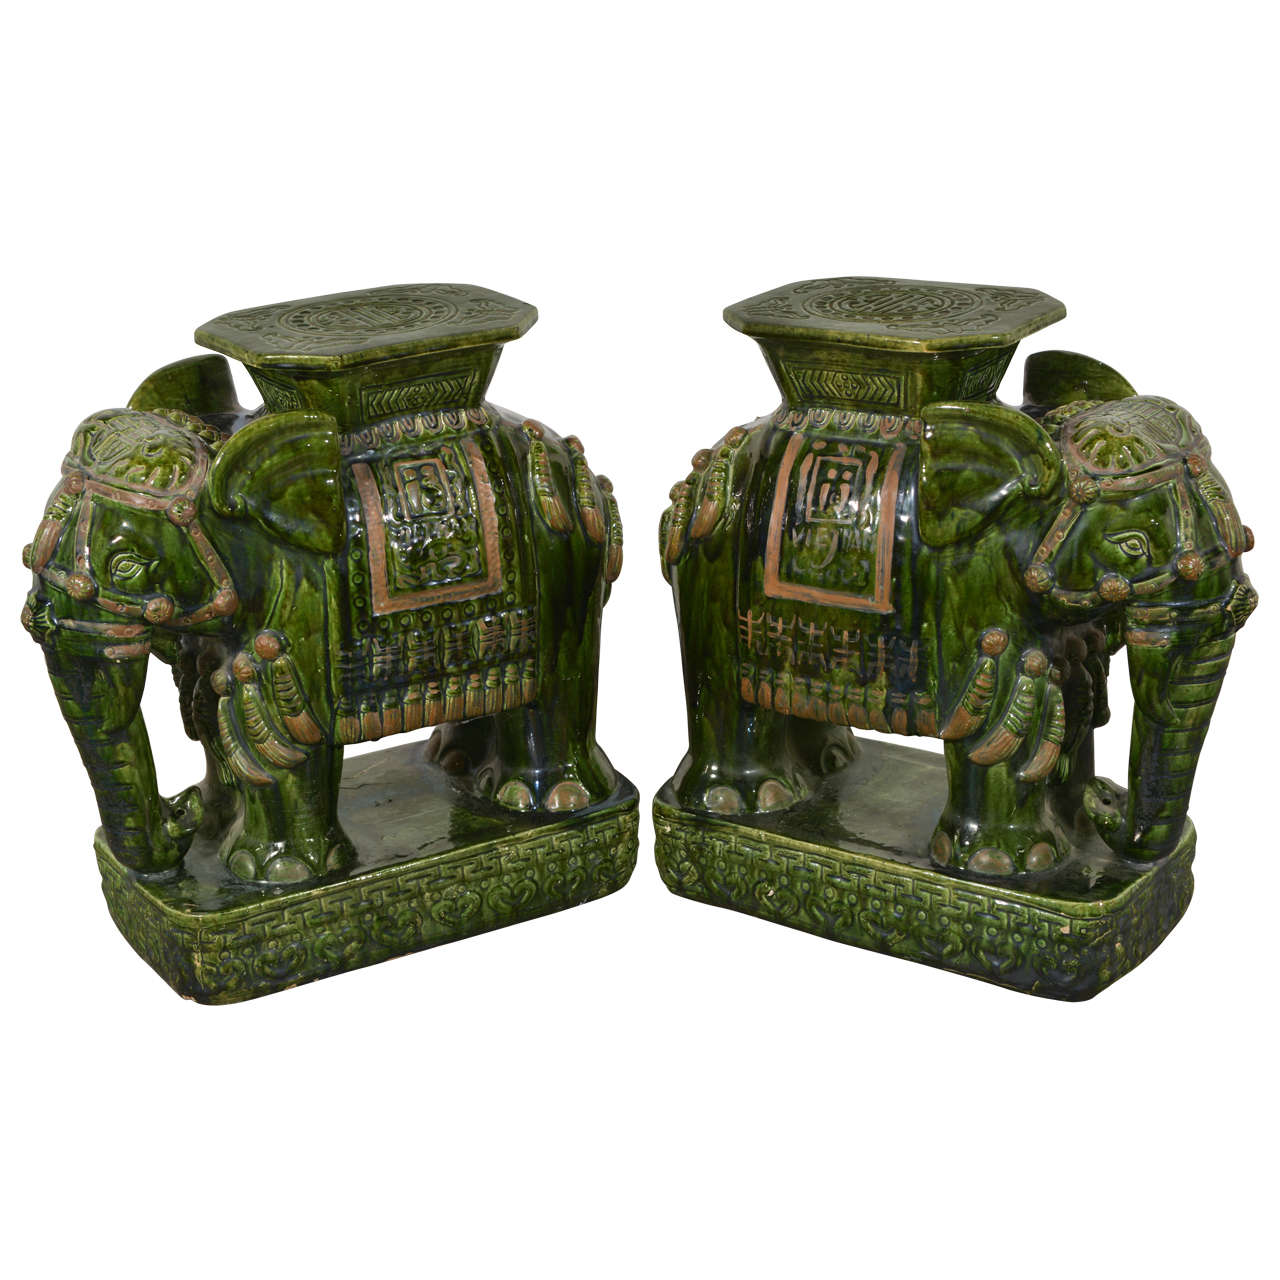 Pair Of Vintage Elephant Garden Stools At 1stdibs